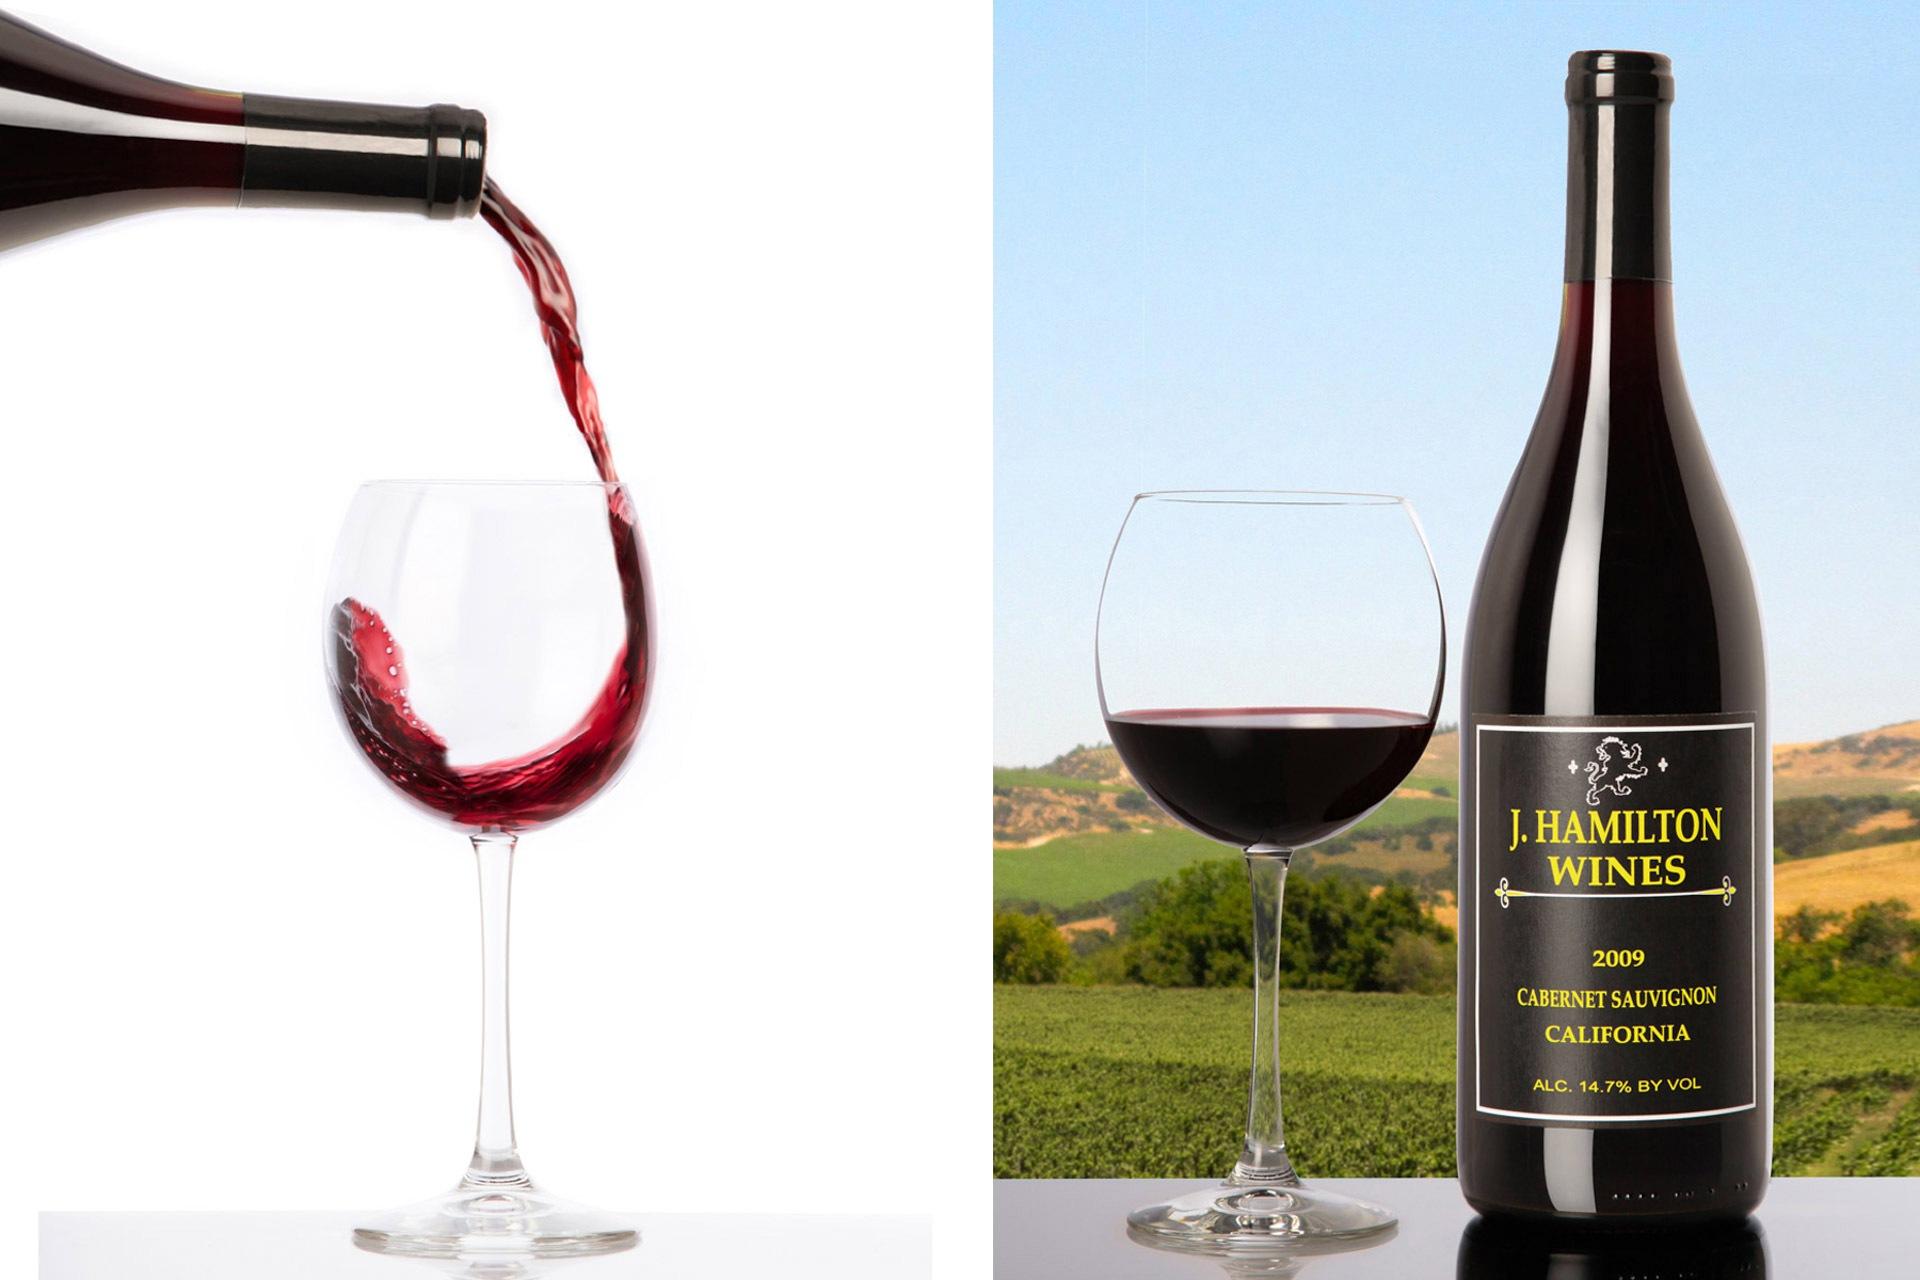 J.Hamilton Wines by ERICK BECH